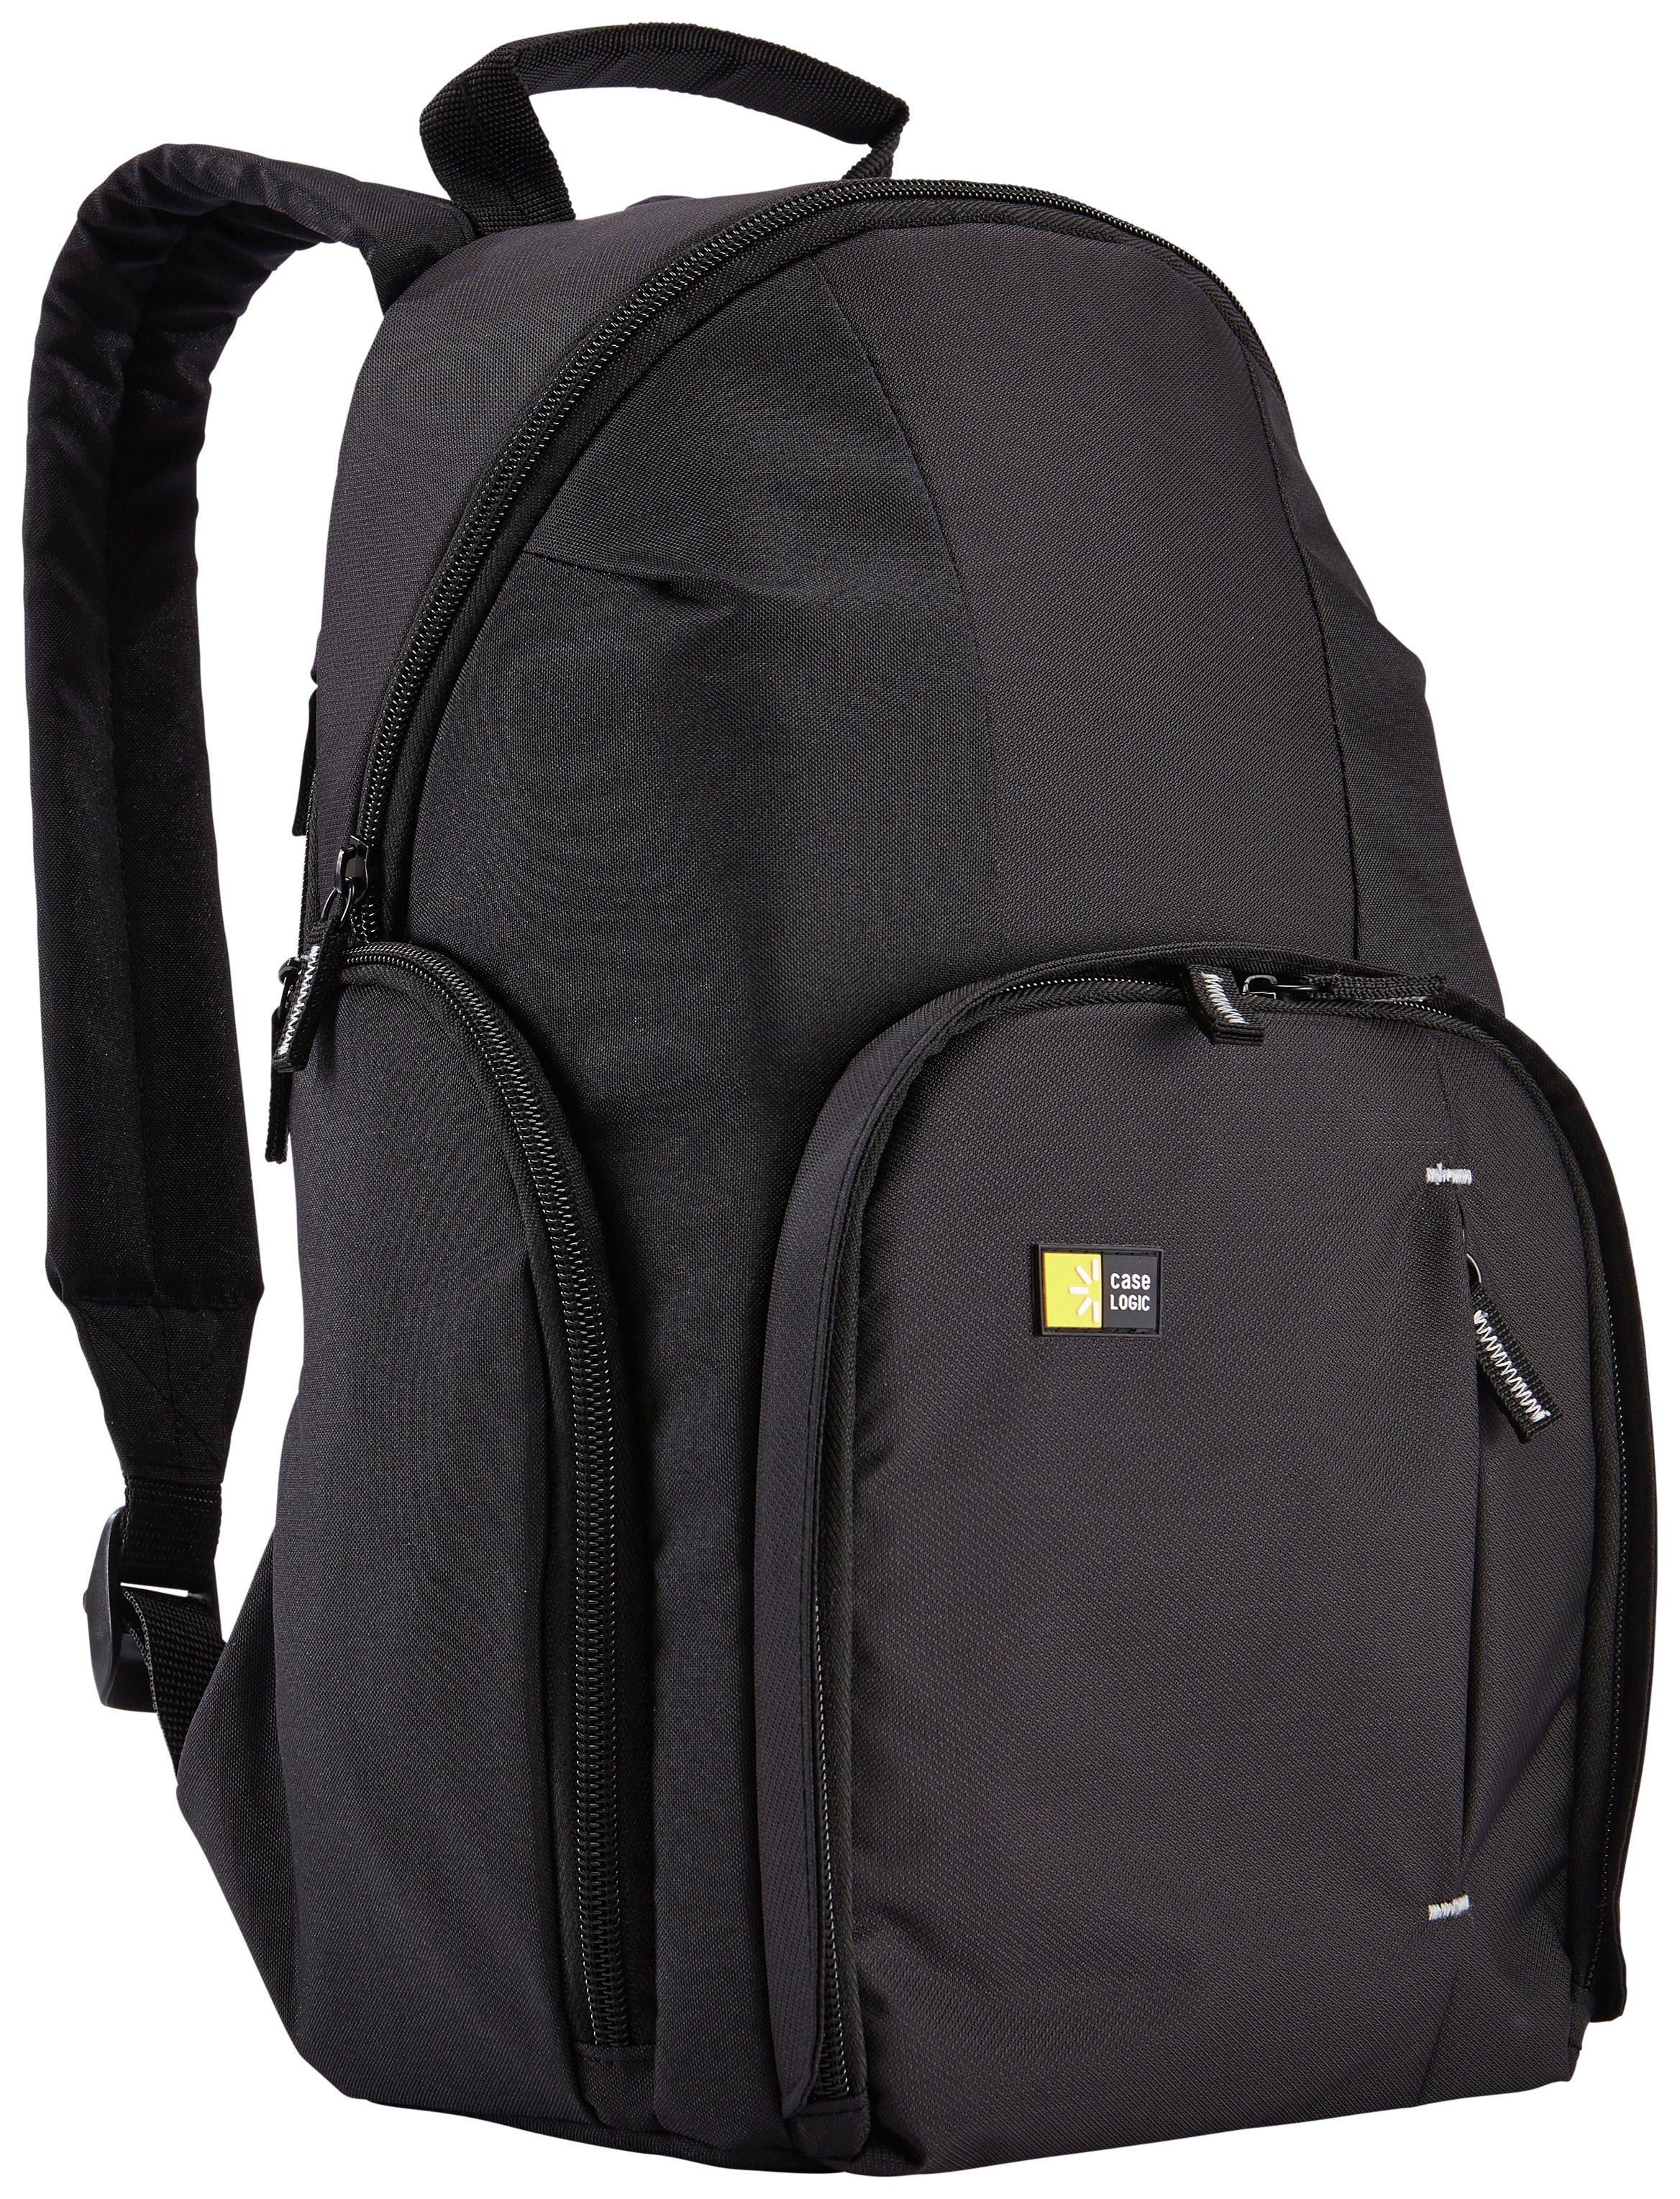 Image of Case Logic Core Nylon DSLR Backpack - Black.